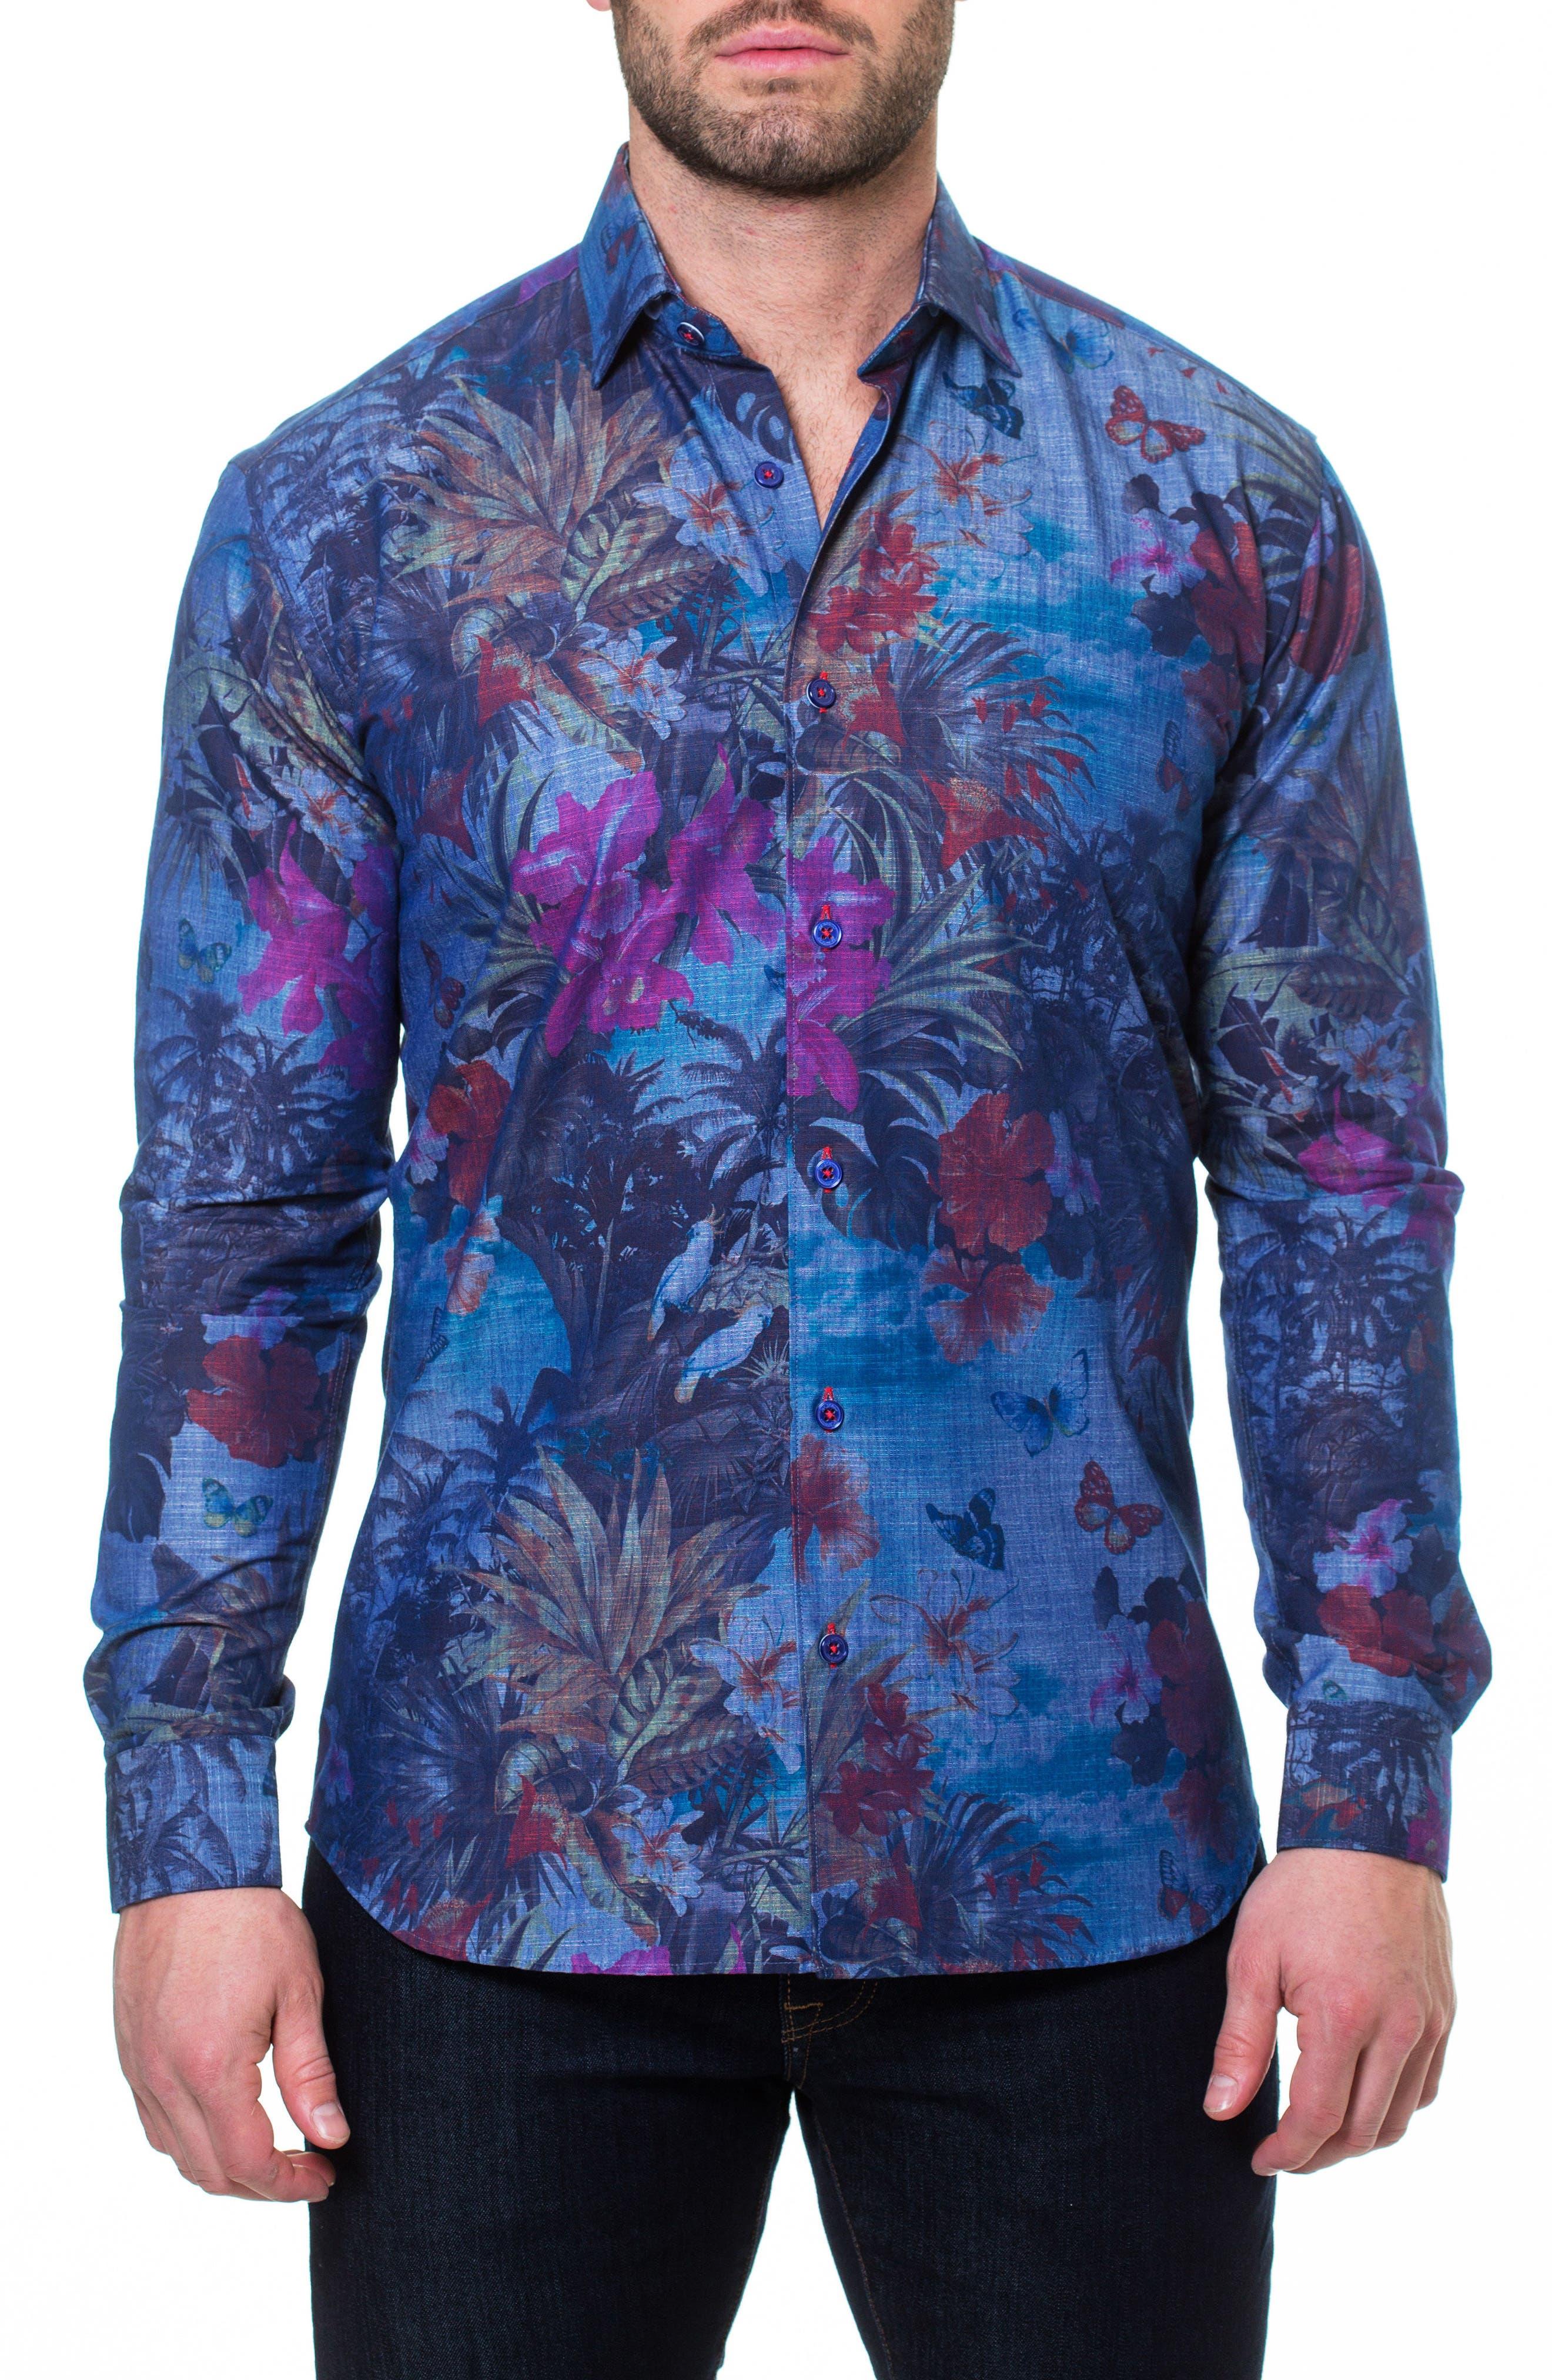 Maceoo Wall Street Paradise Sport Shirt